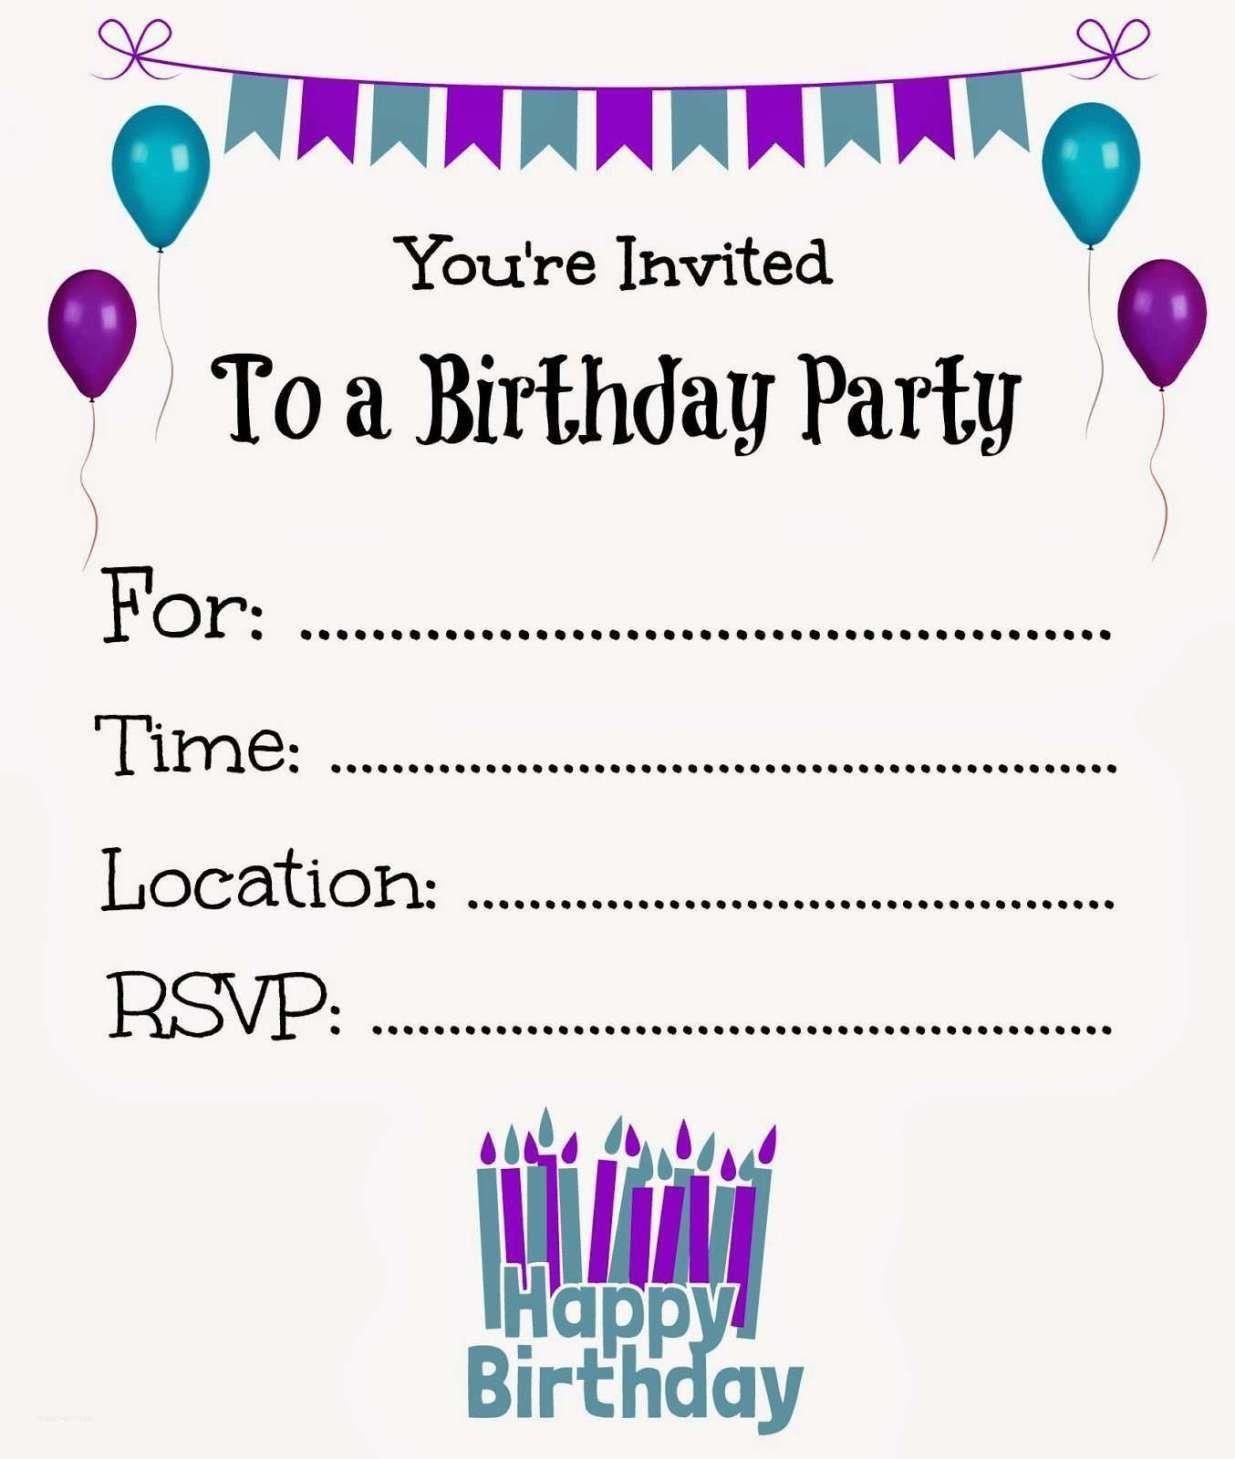 002 Impressive Free Online Invitation Template Printable Photo  Baby Shower WeddingFull